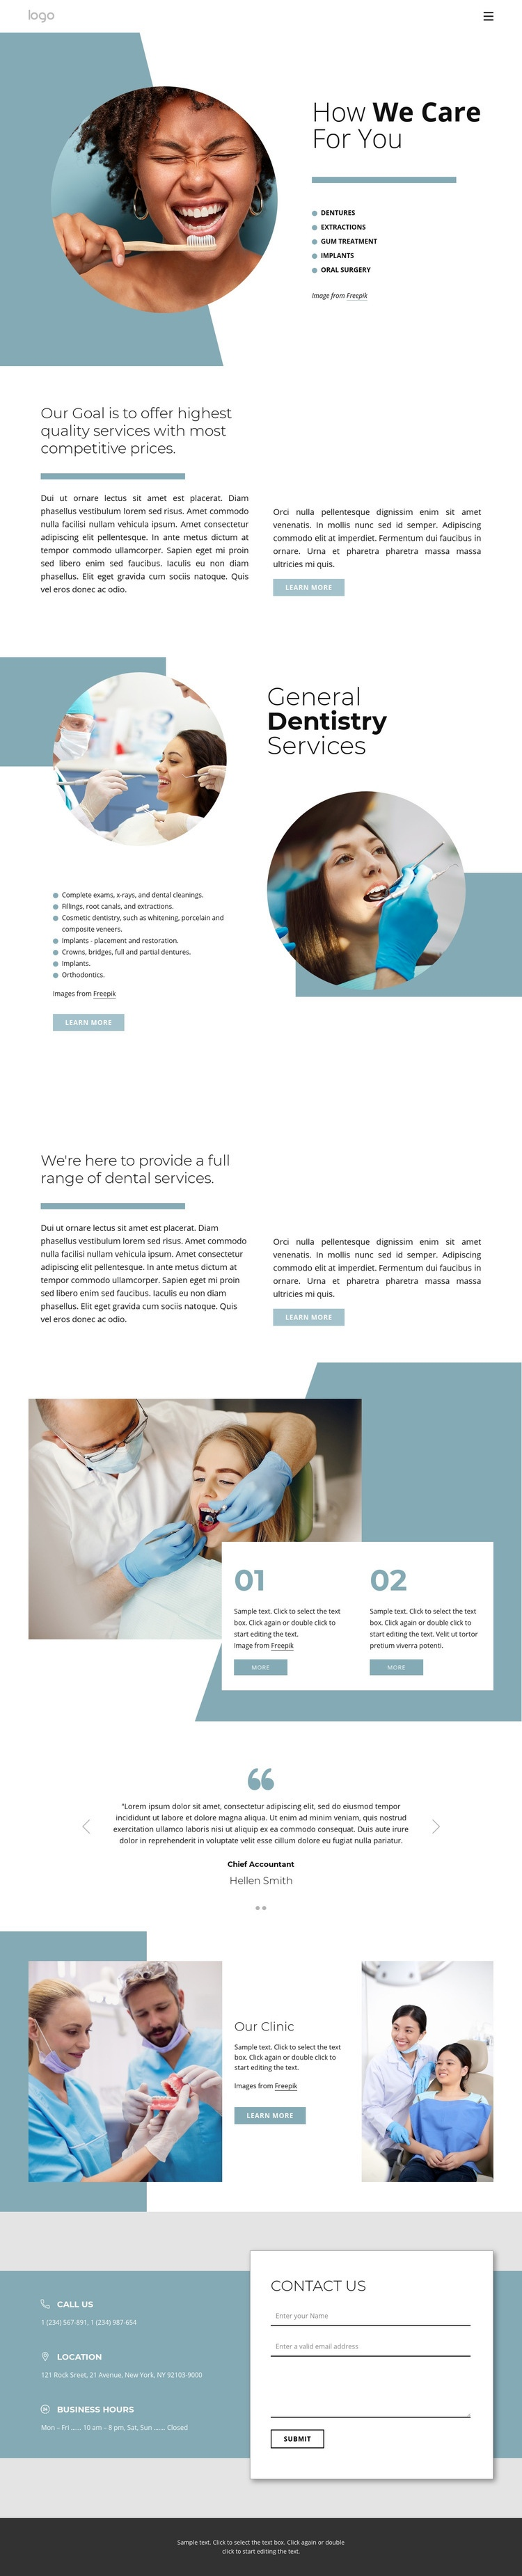 Hight quality dental services Web Page Designer